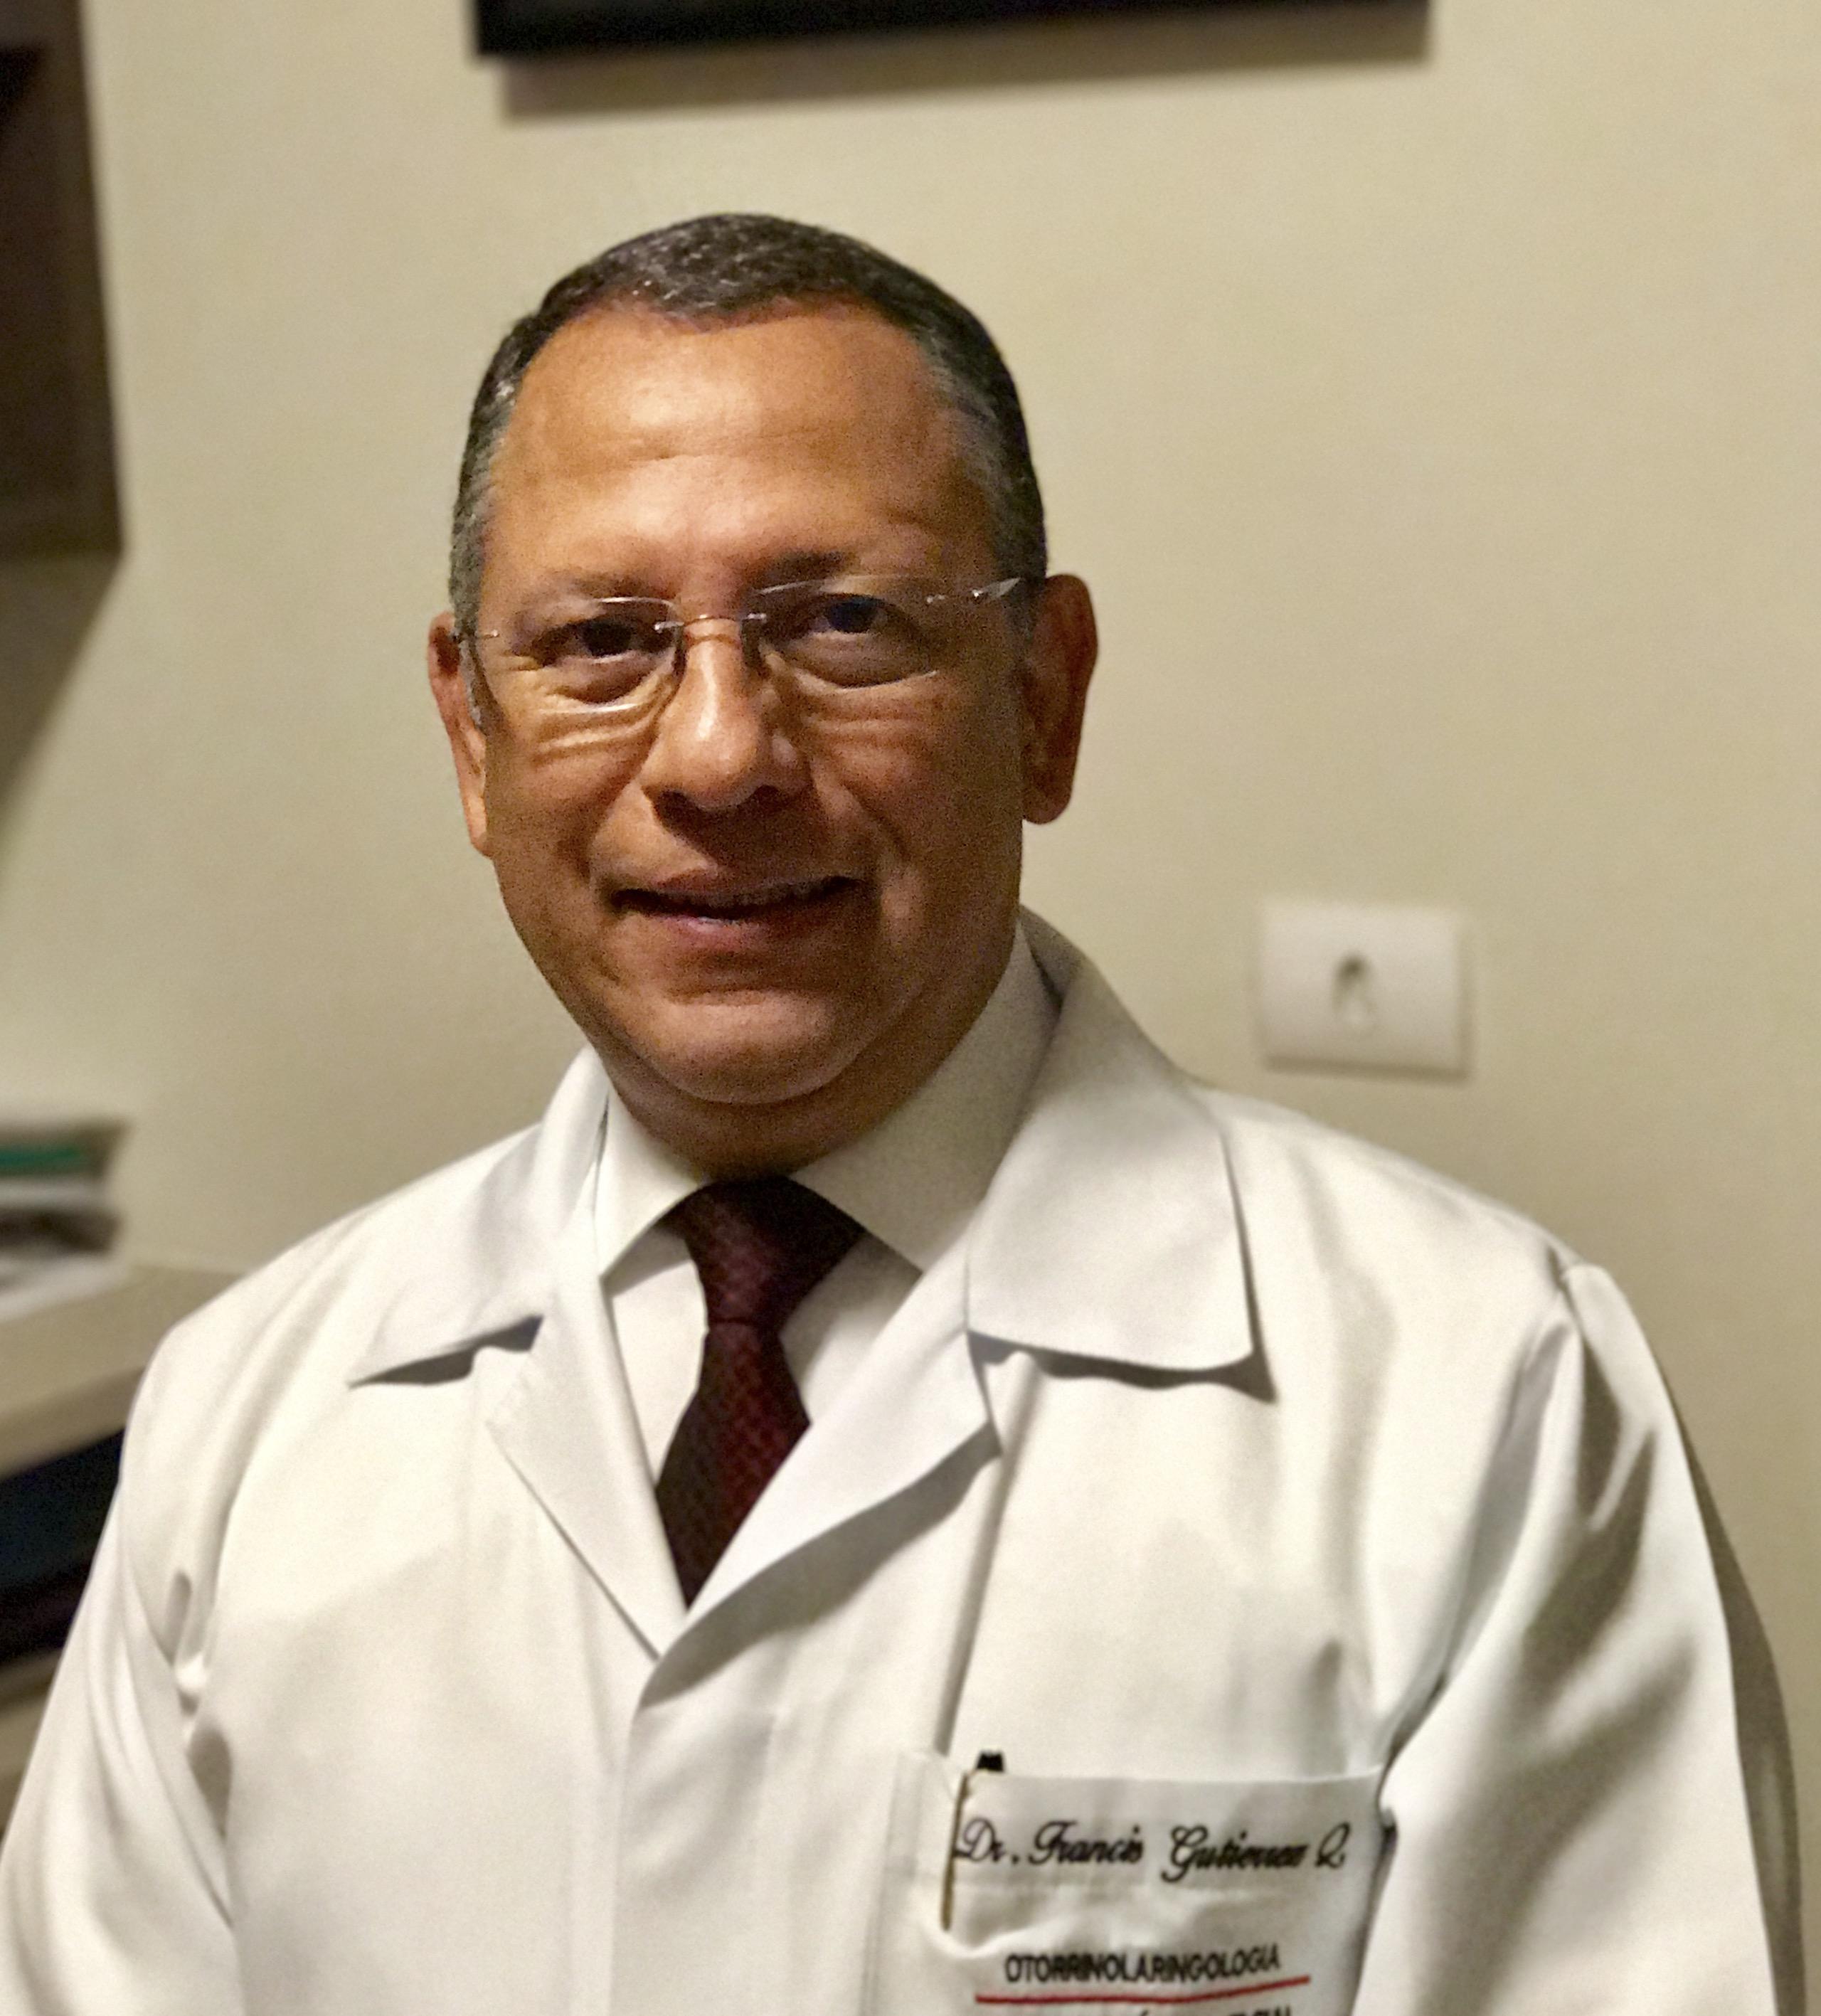 Francis Gutierrez Quintana